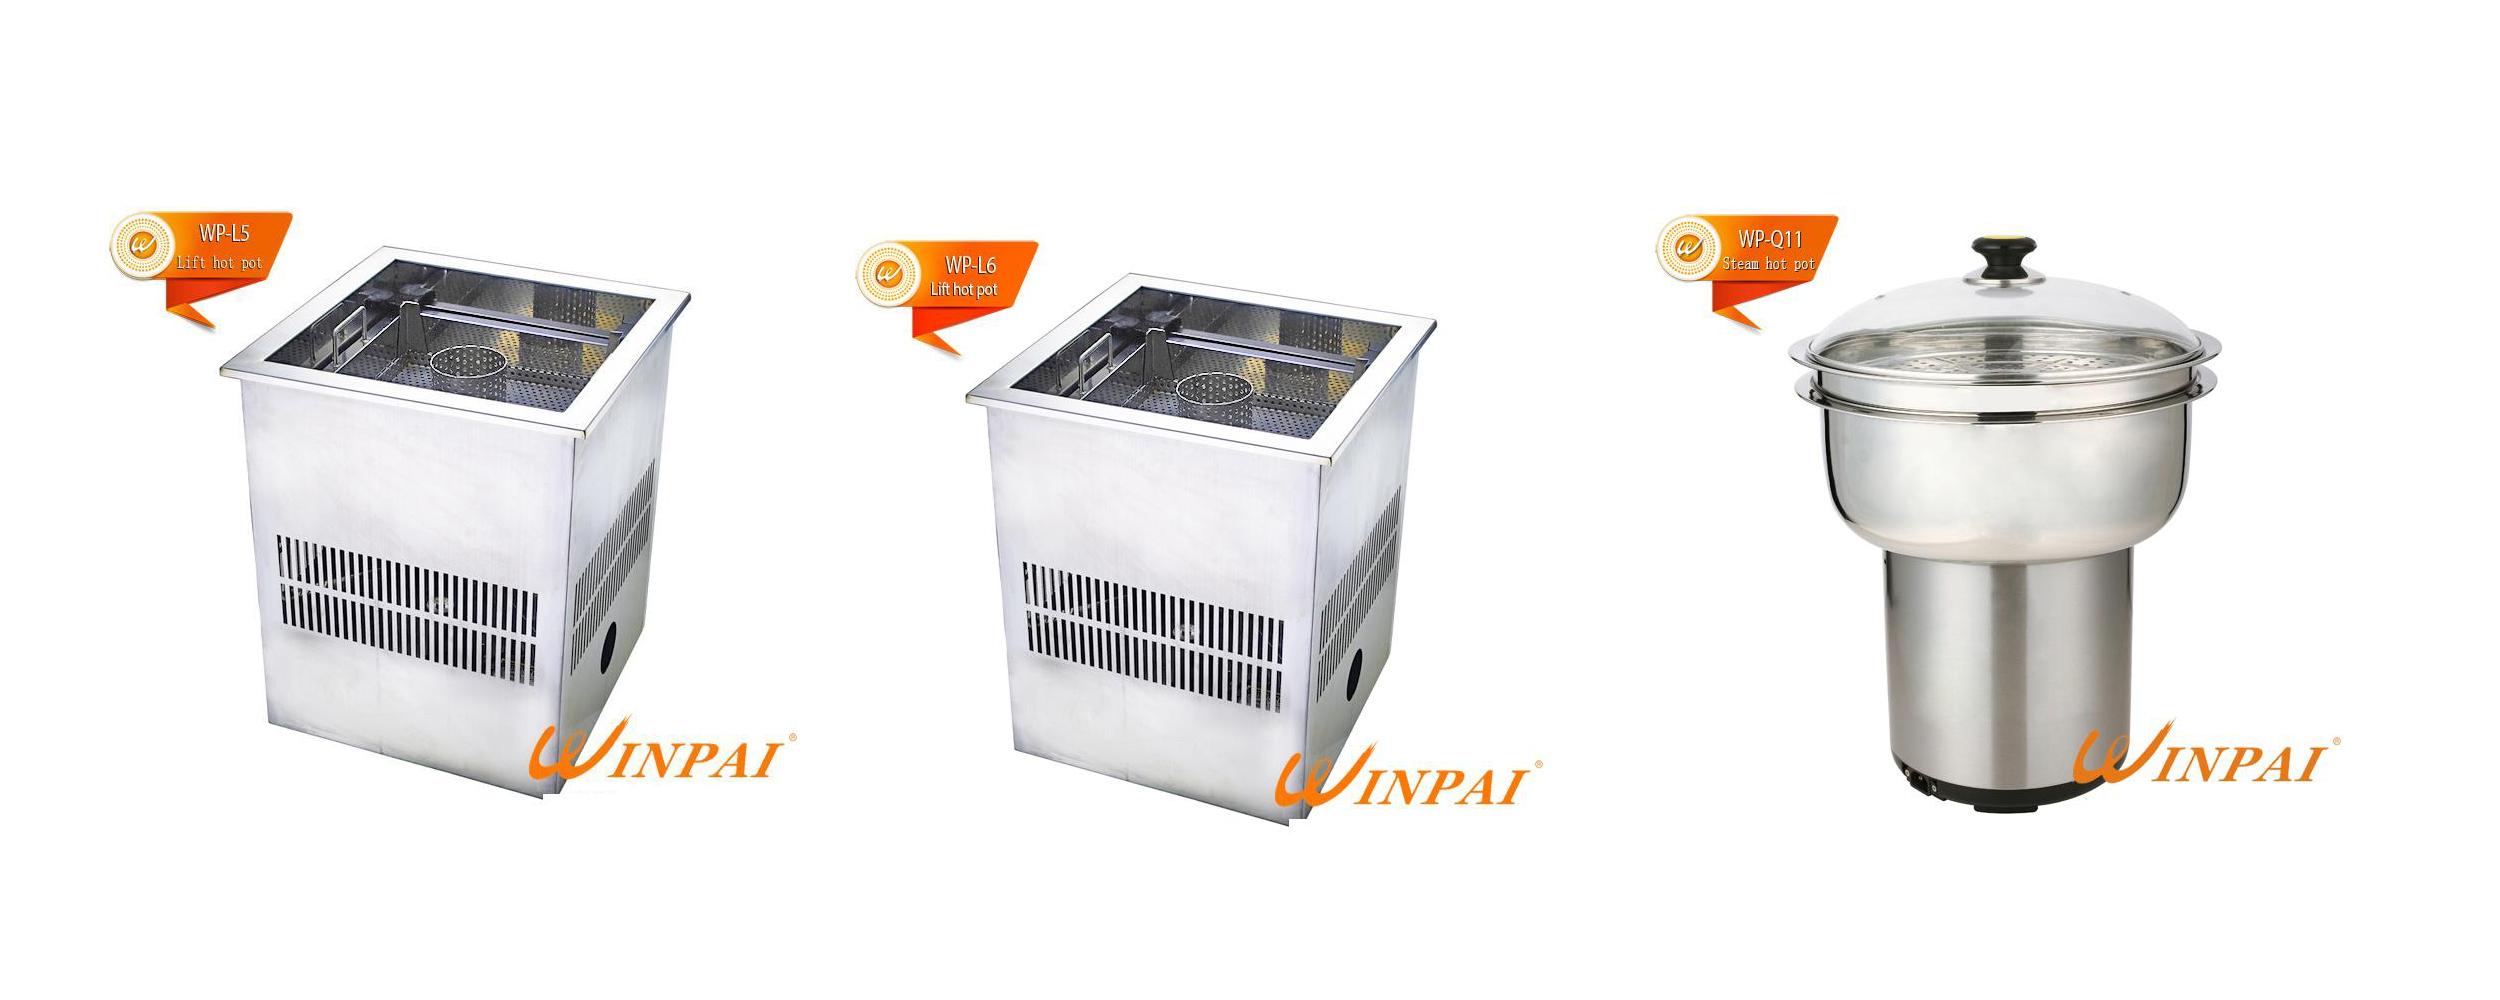 WINPAI smokeless induction burner price manufacturer for restaurant-5